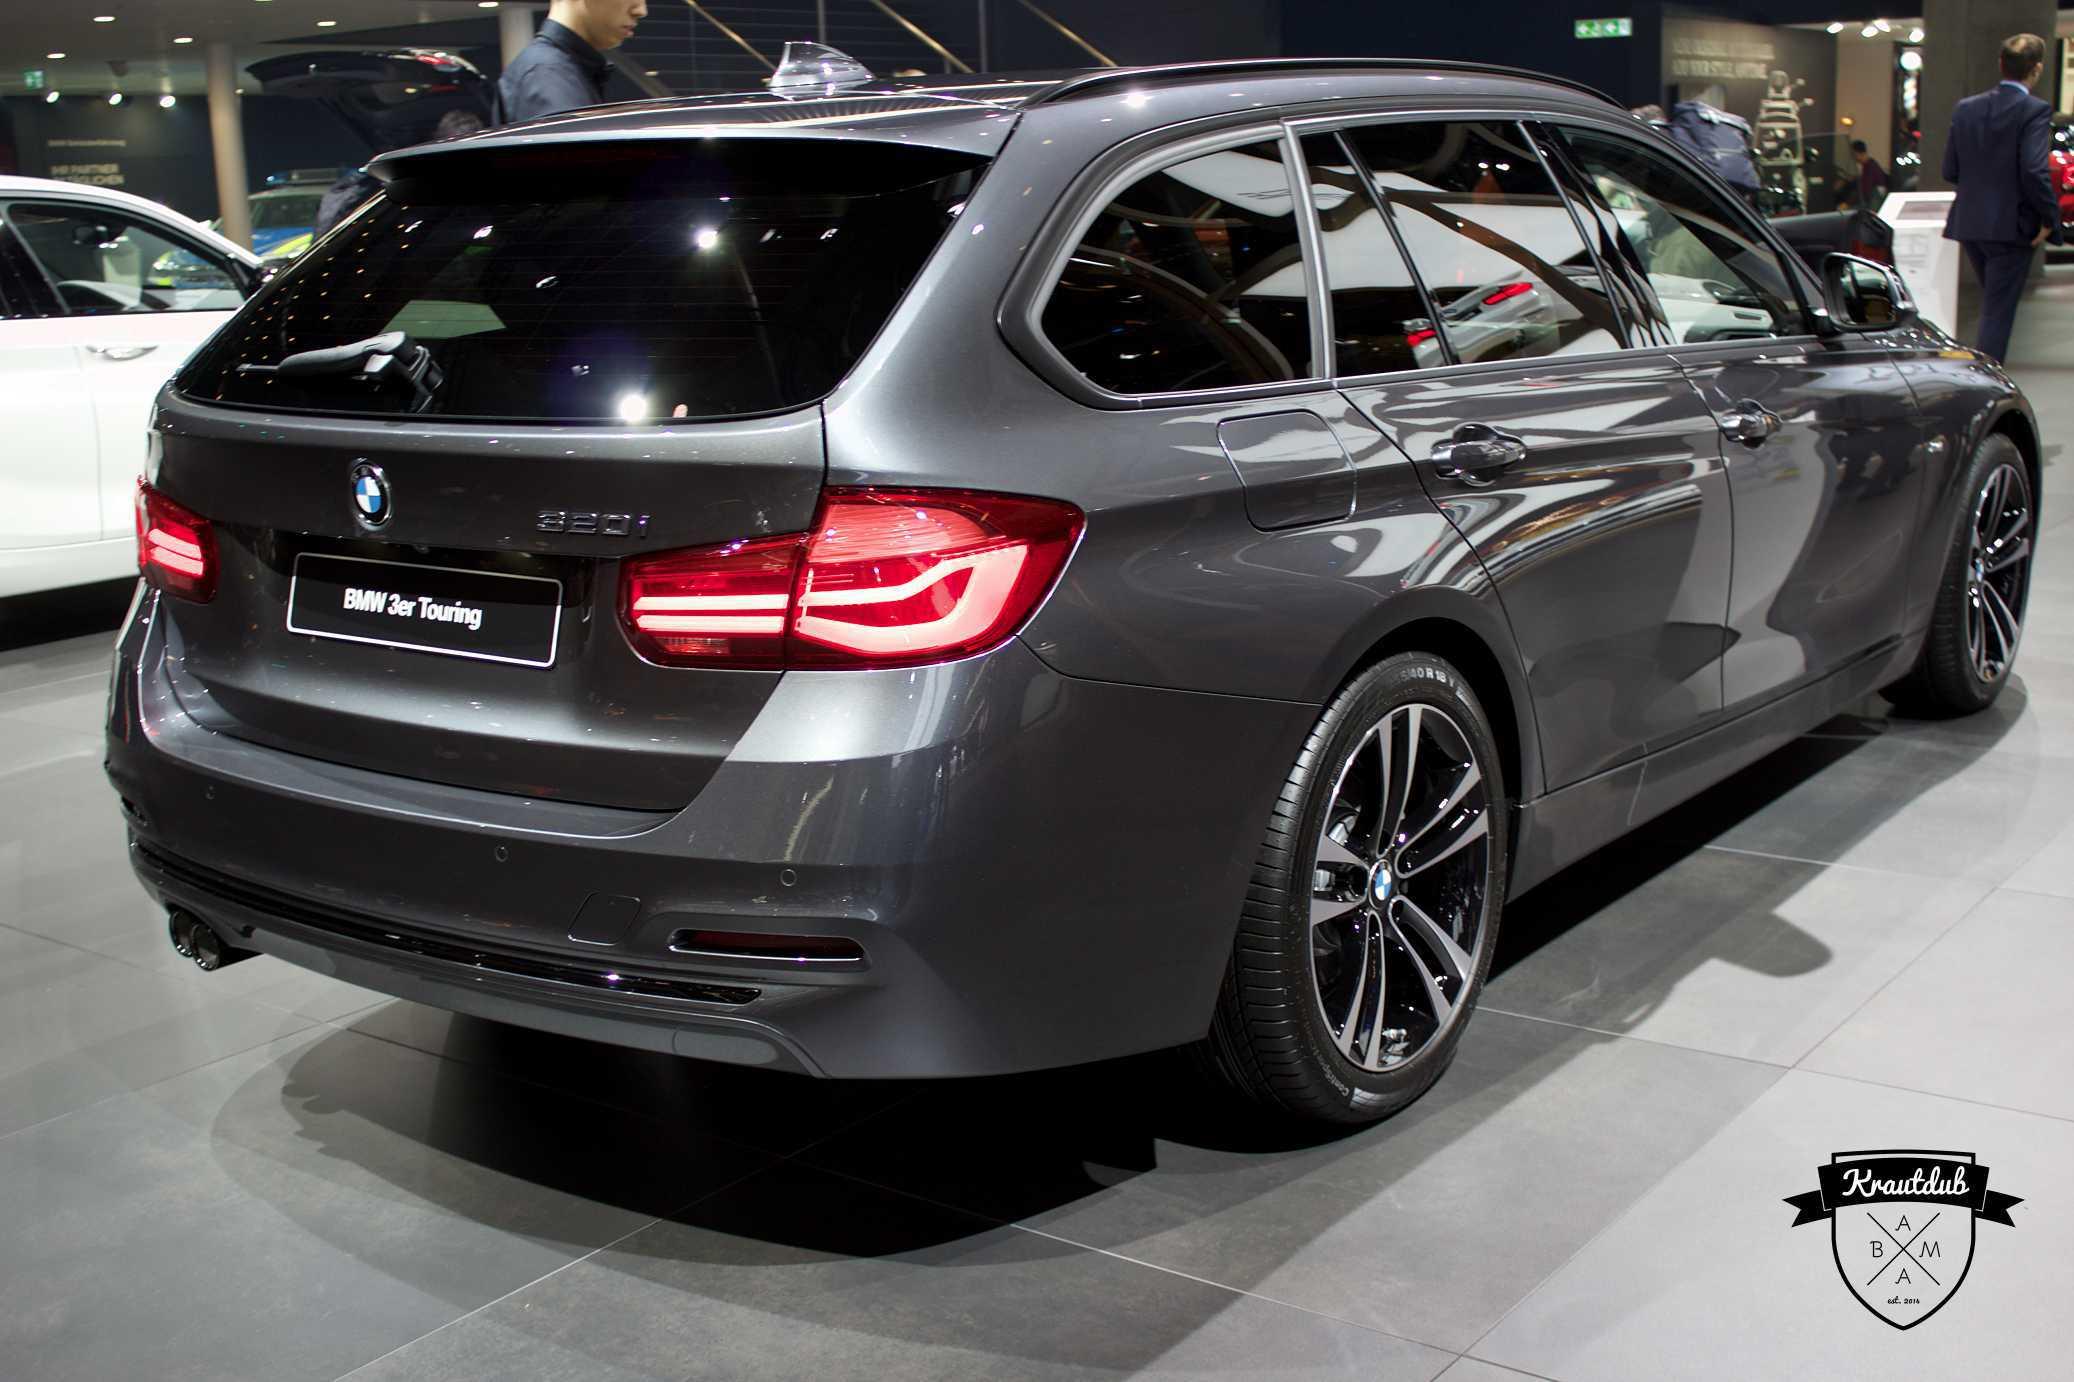 BMW 320i Touring - IAA 2017